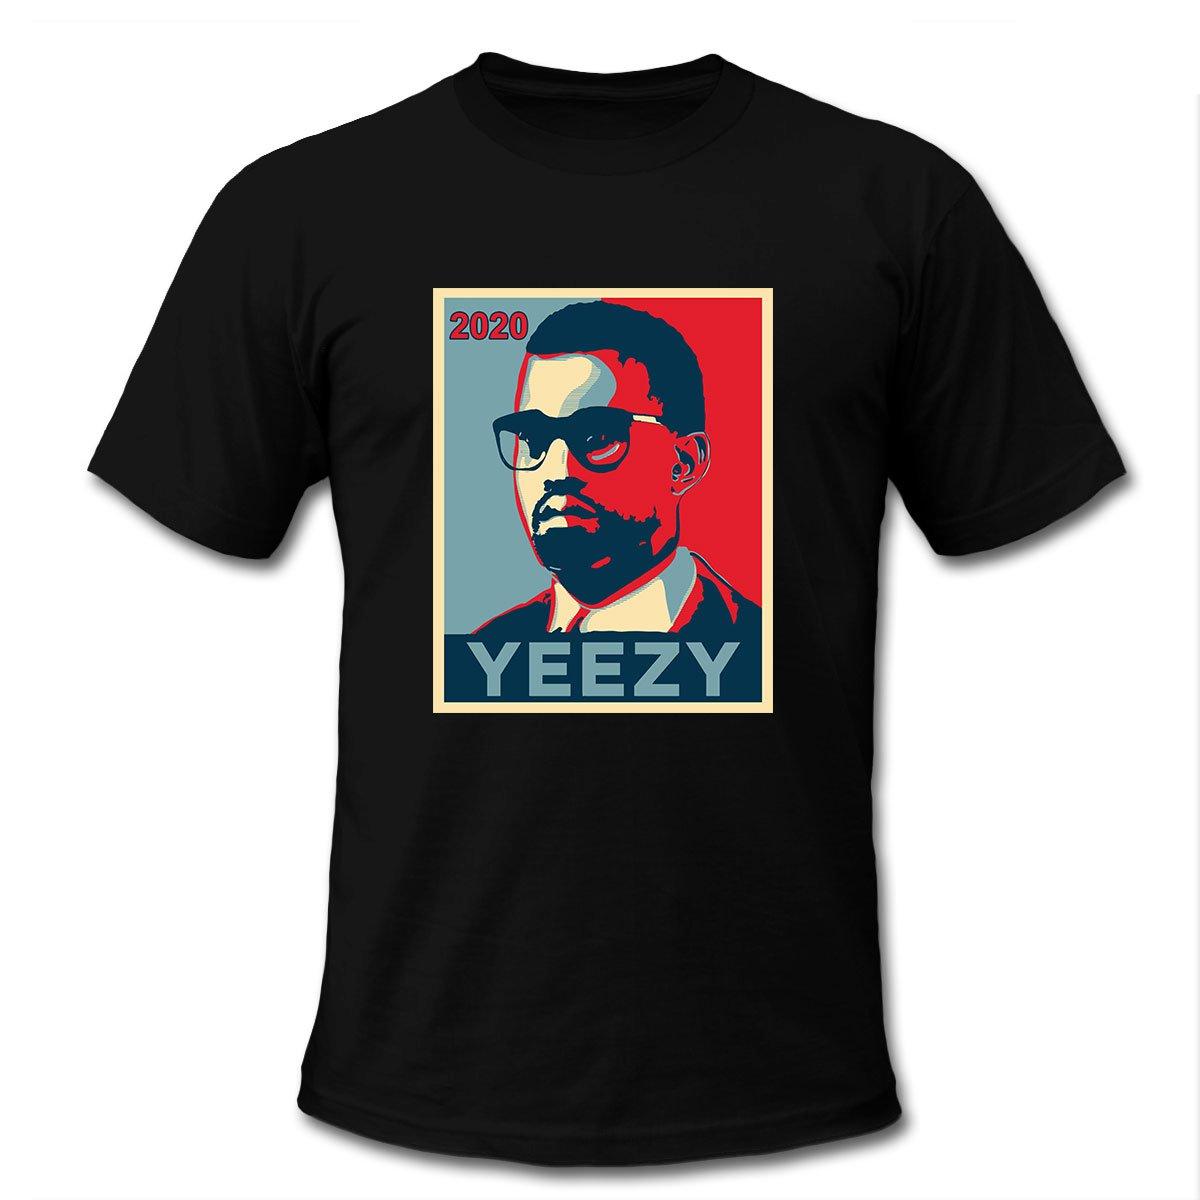 Yeezy for President 2020 USA. Kanye